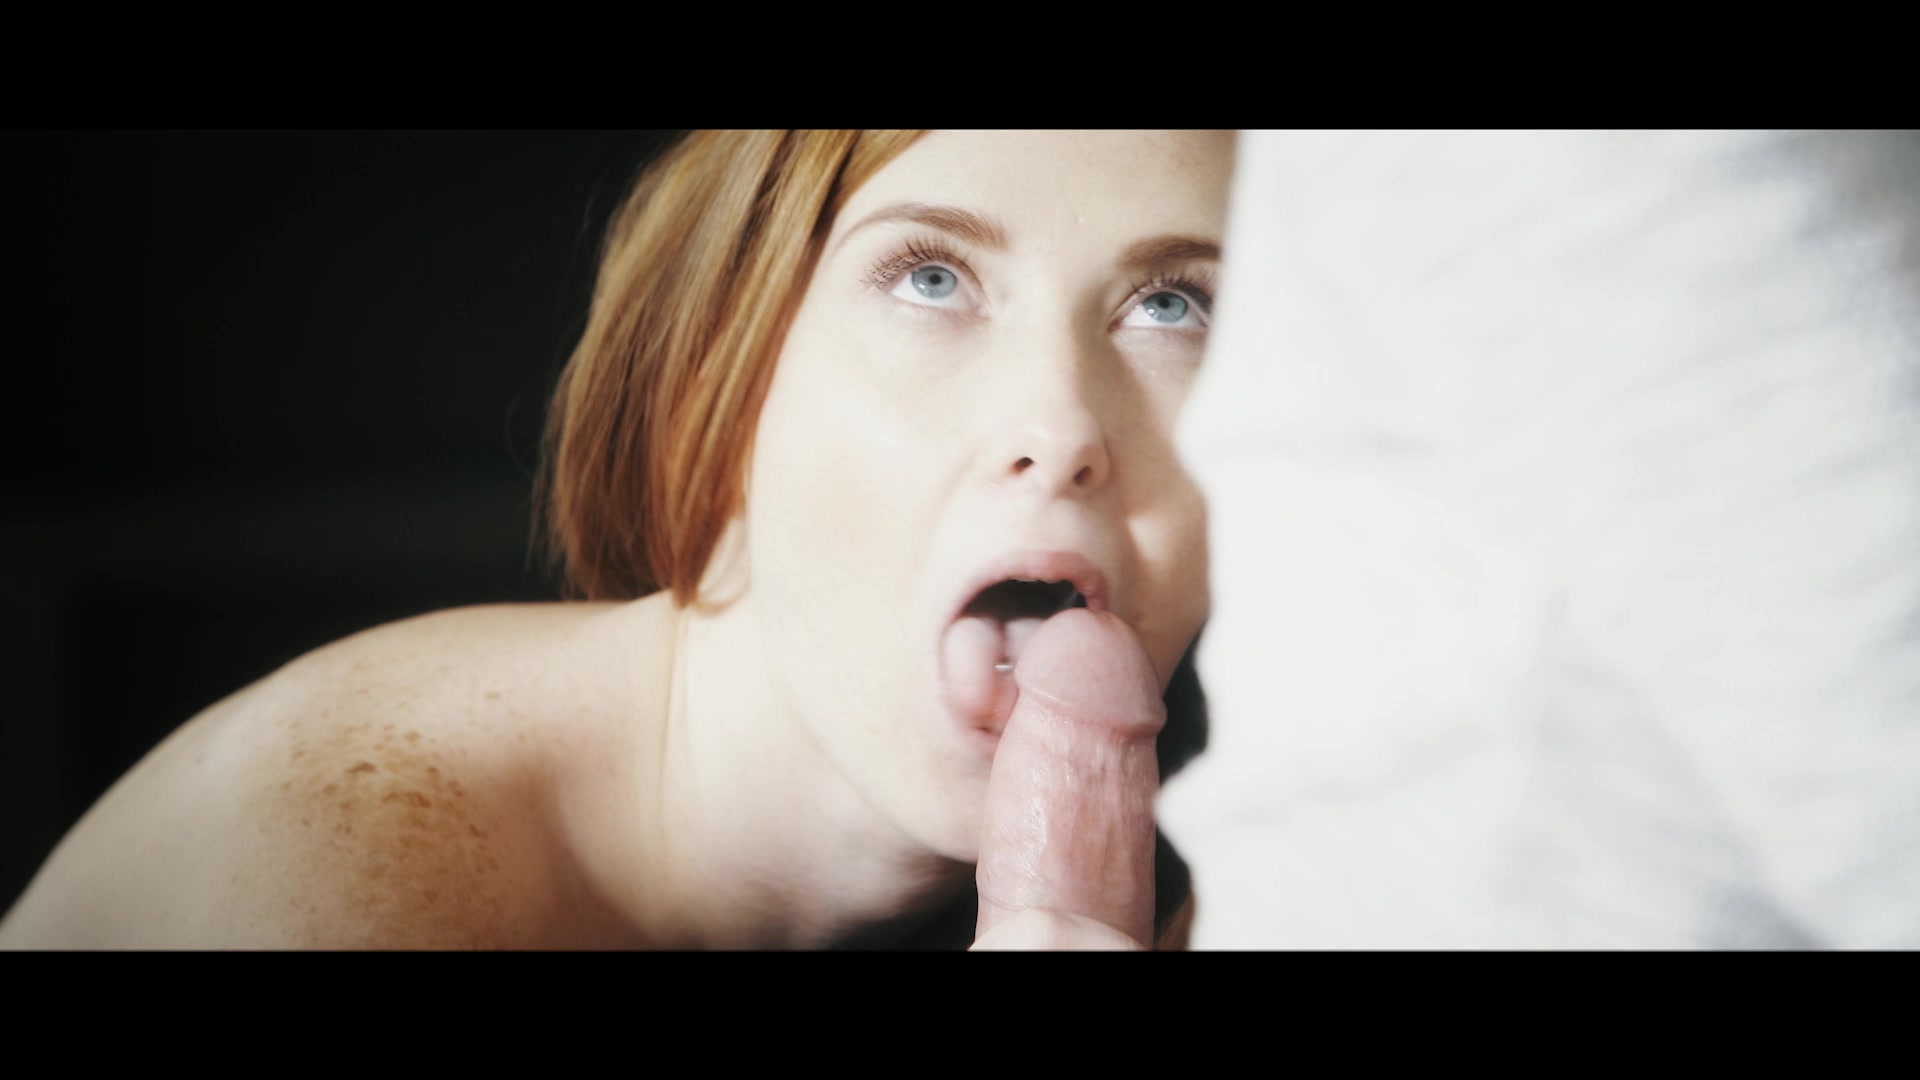 Playboy TV: The Life Erotic, Season 1, Ep. 8 16